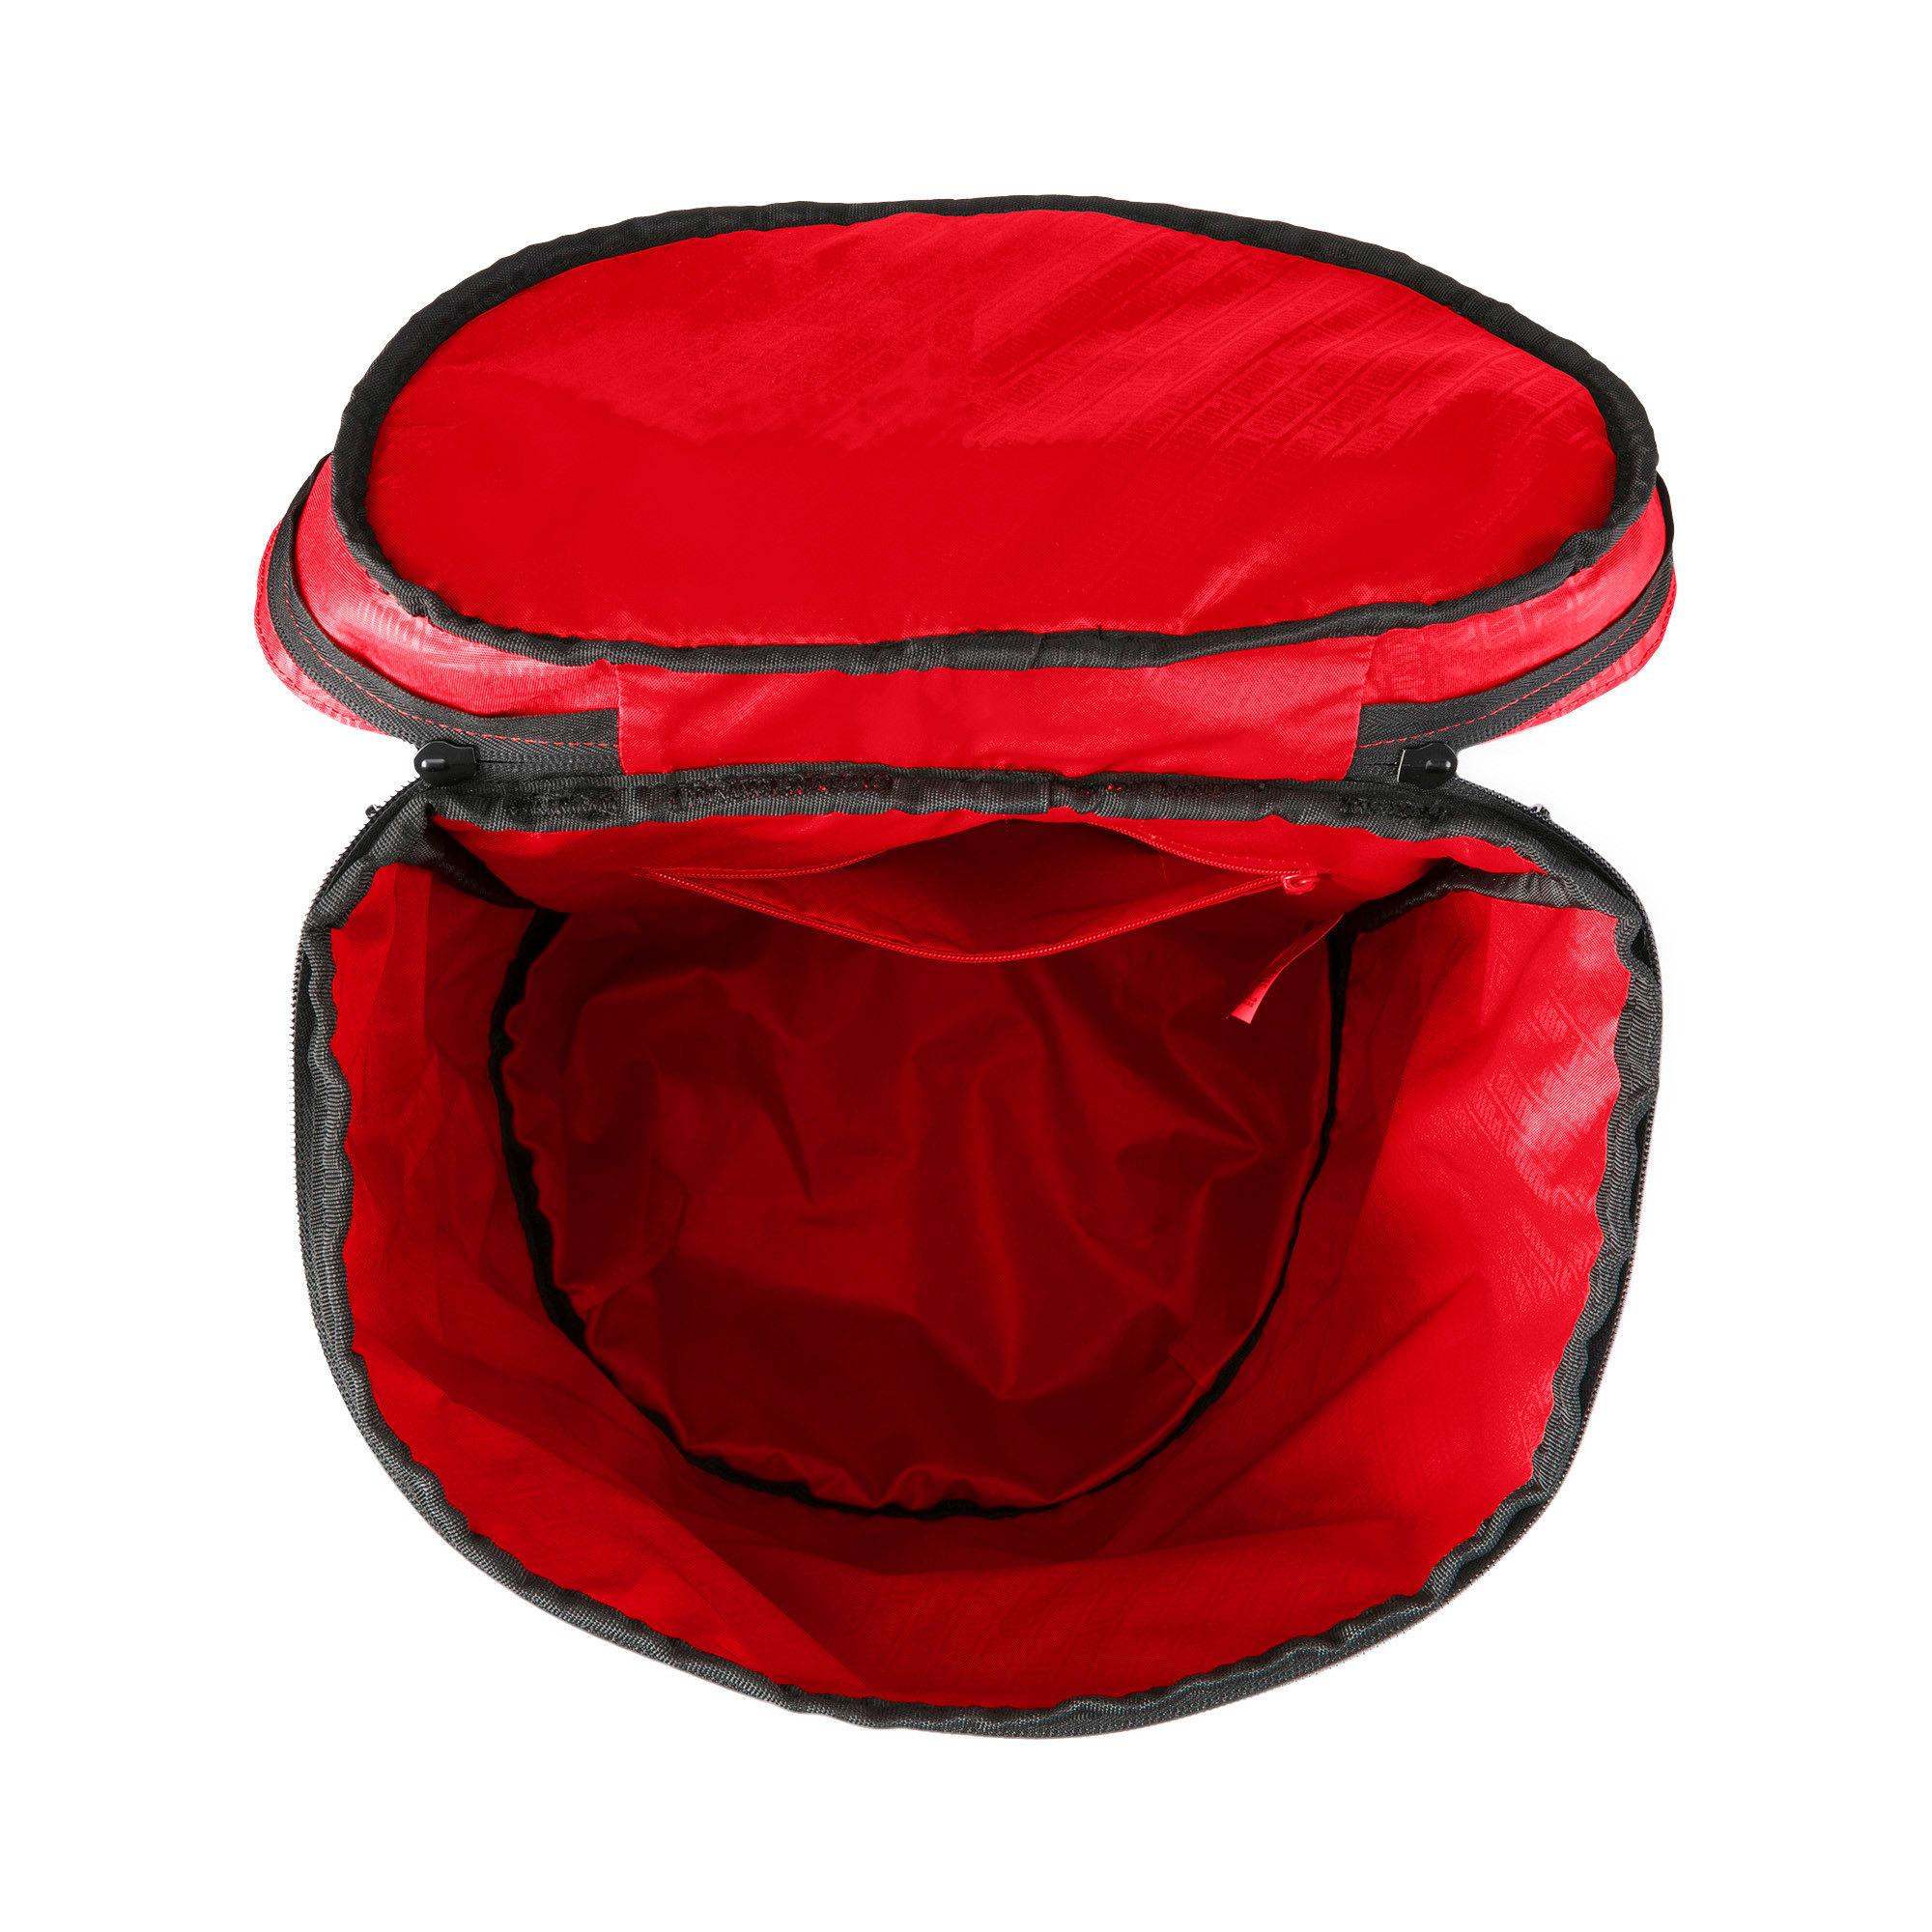 Thumbnail 5 of Ferrari Fanwear RCT Backpack, Rosso Corsa, medium-IND